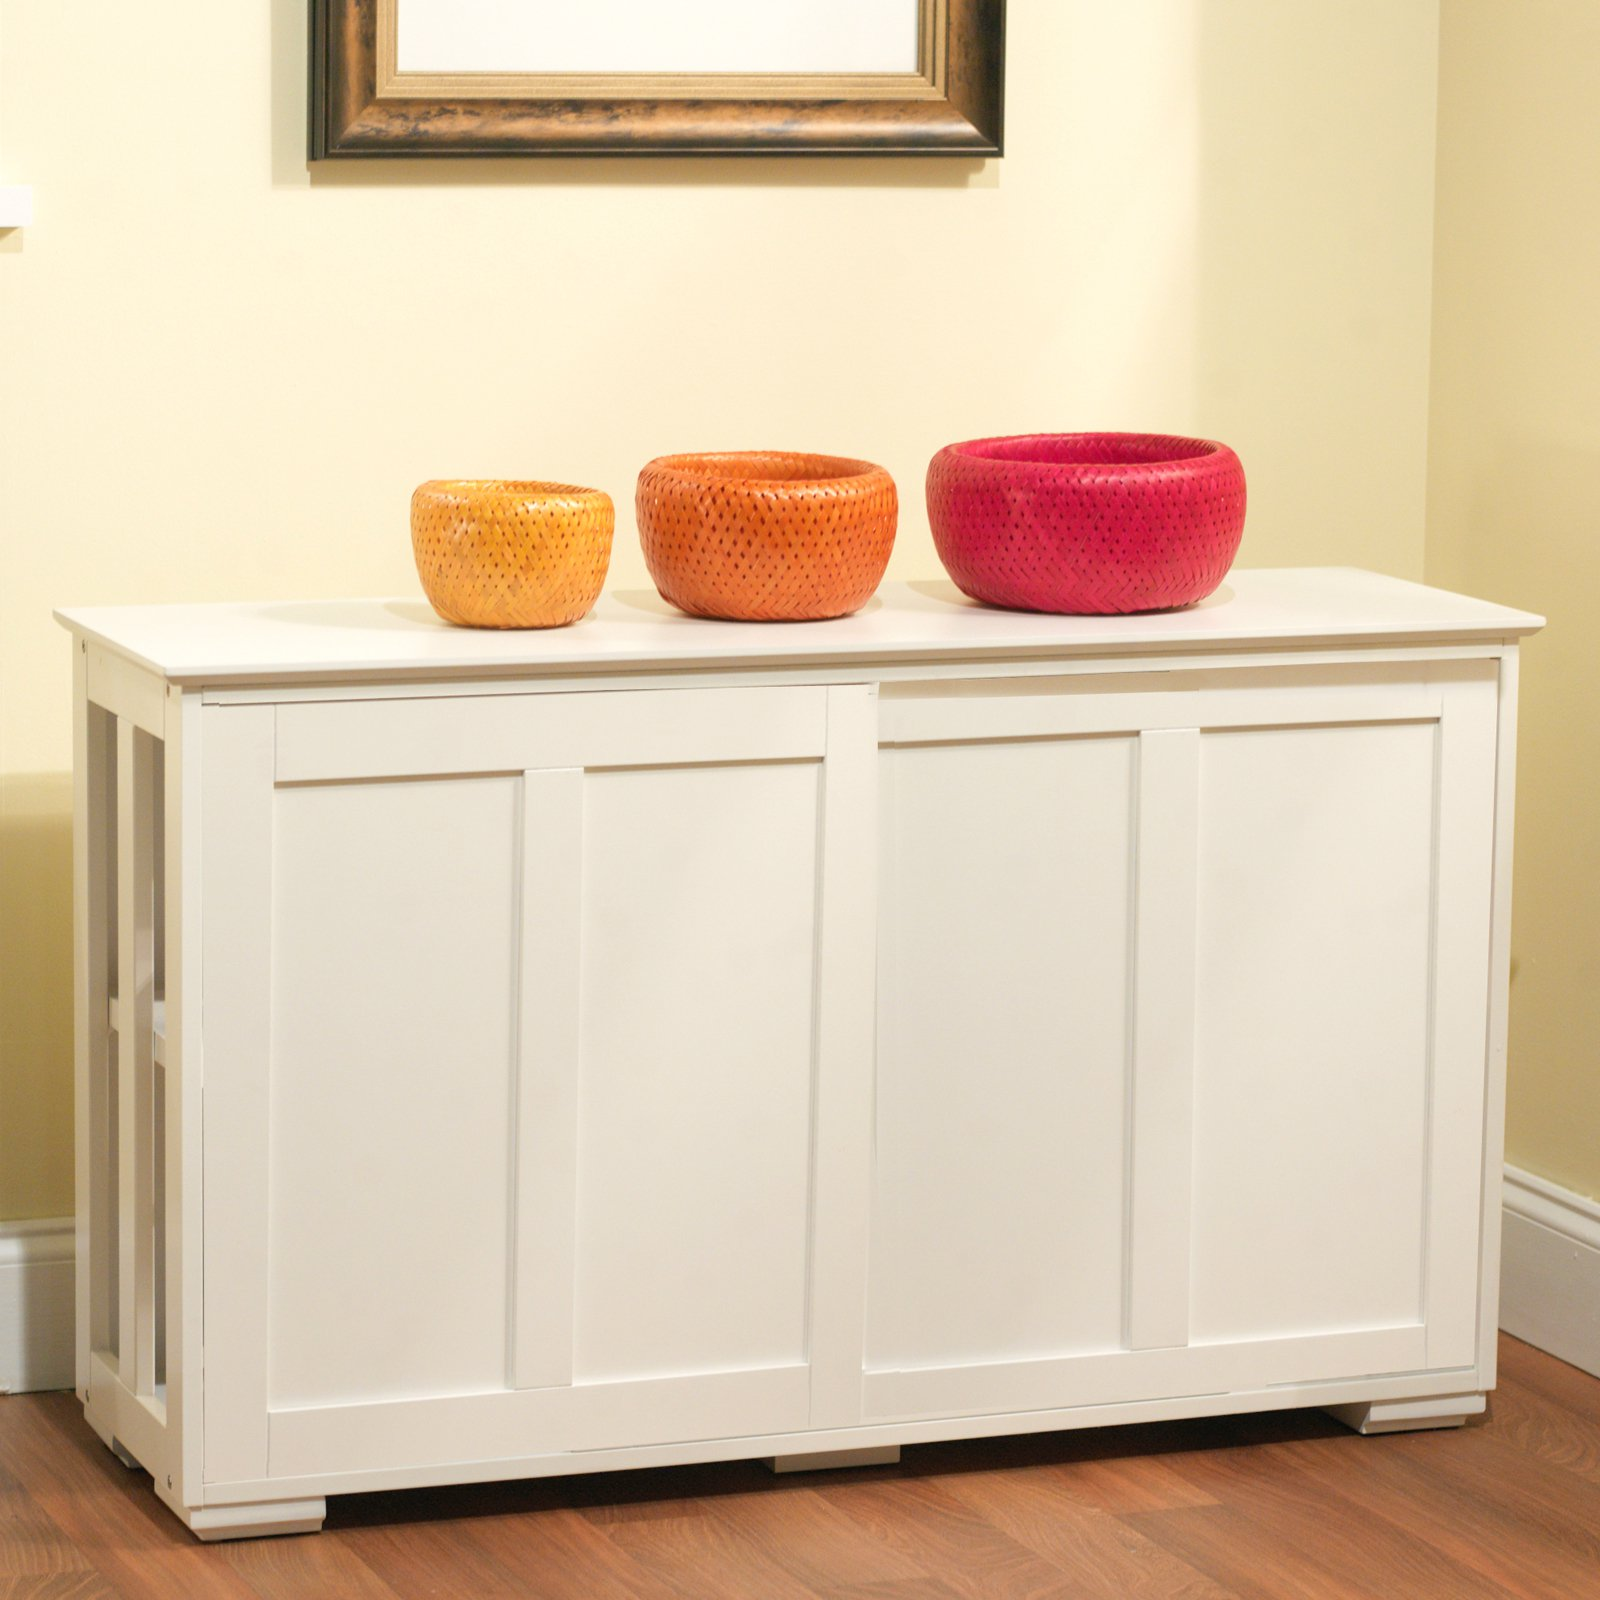 Sliding Wood Doors Stackable Storage Cabinet, Multiple Colors